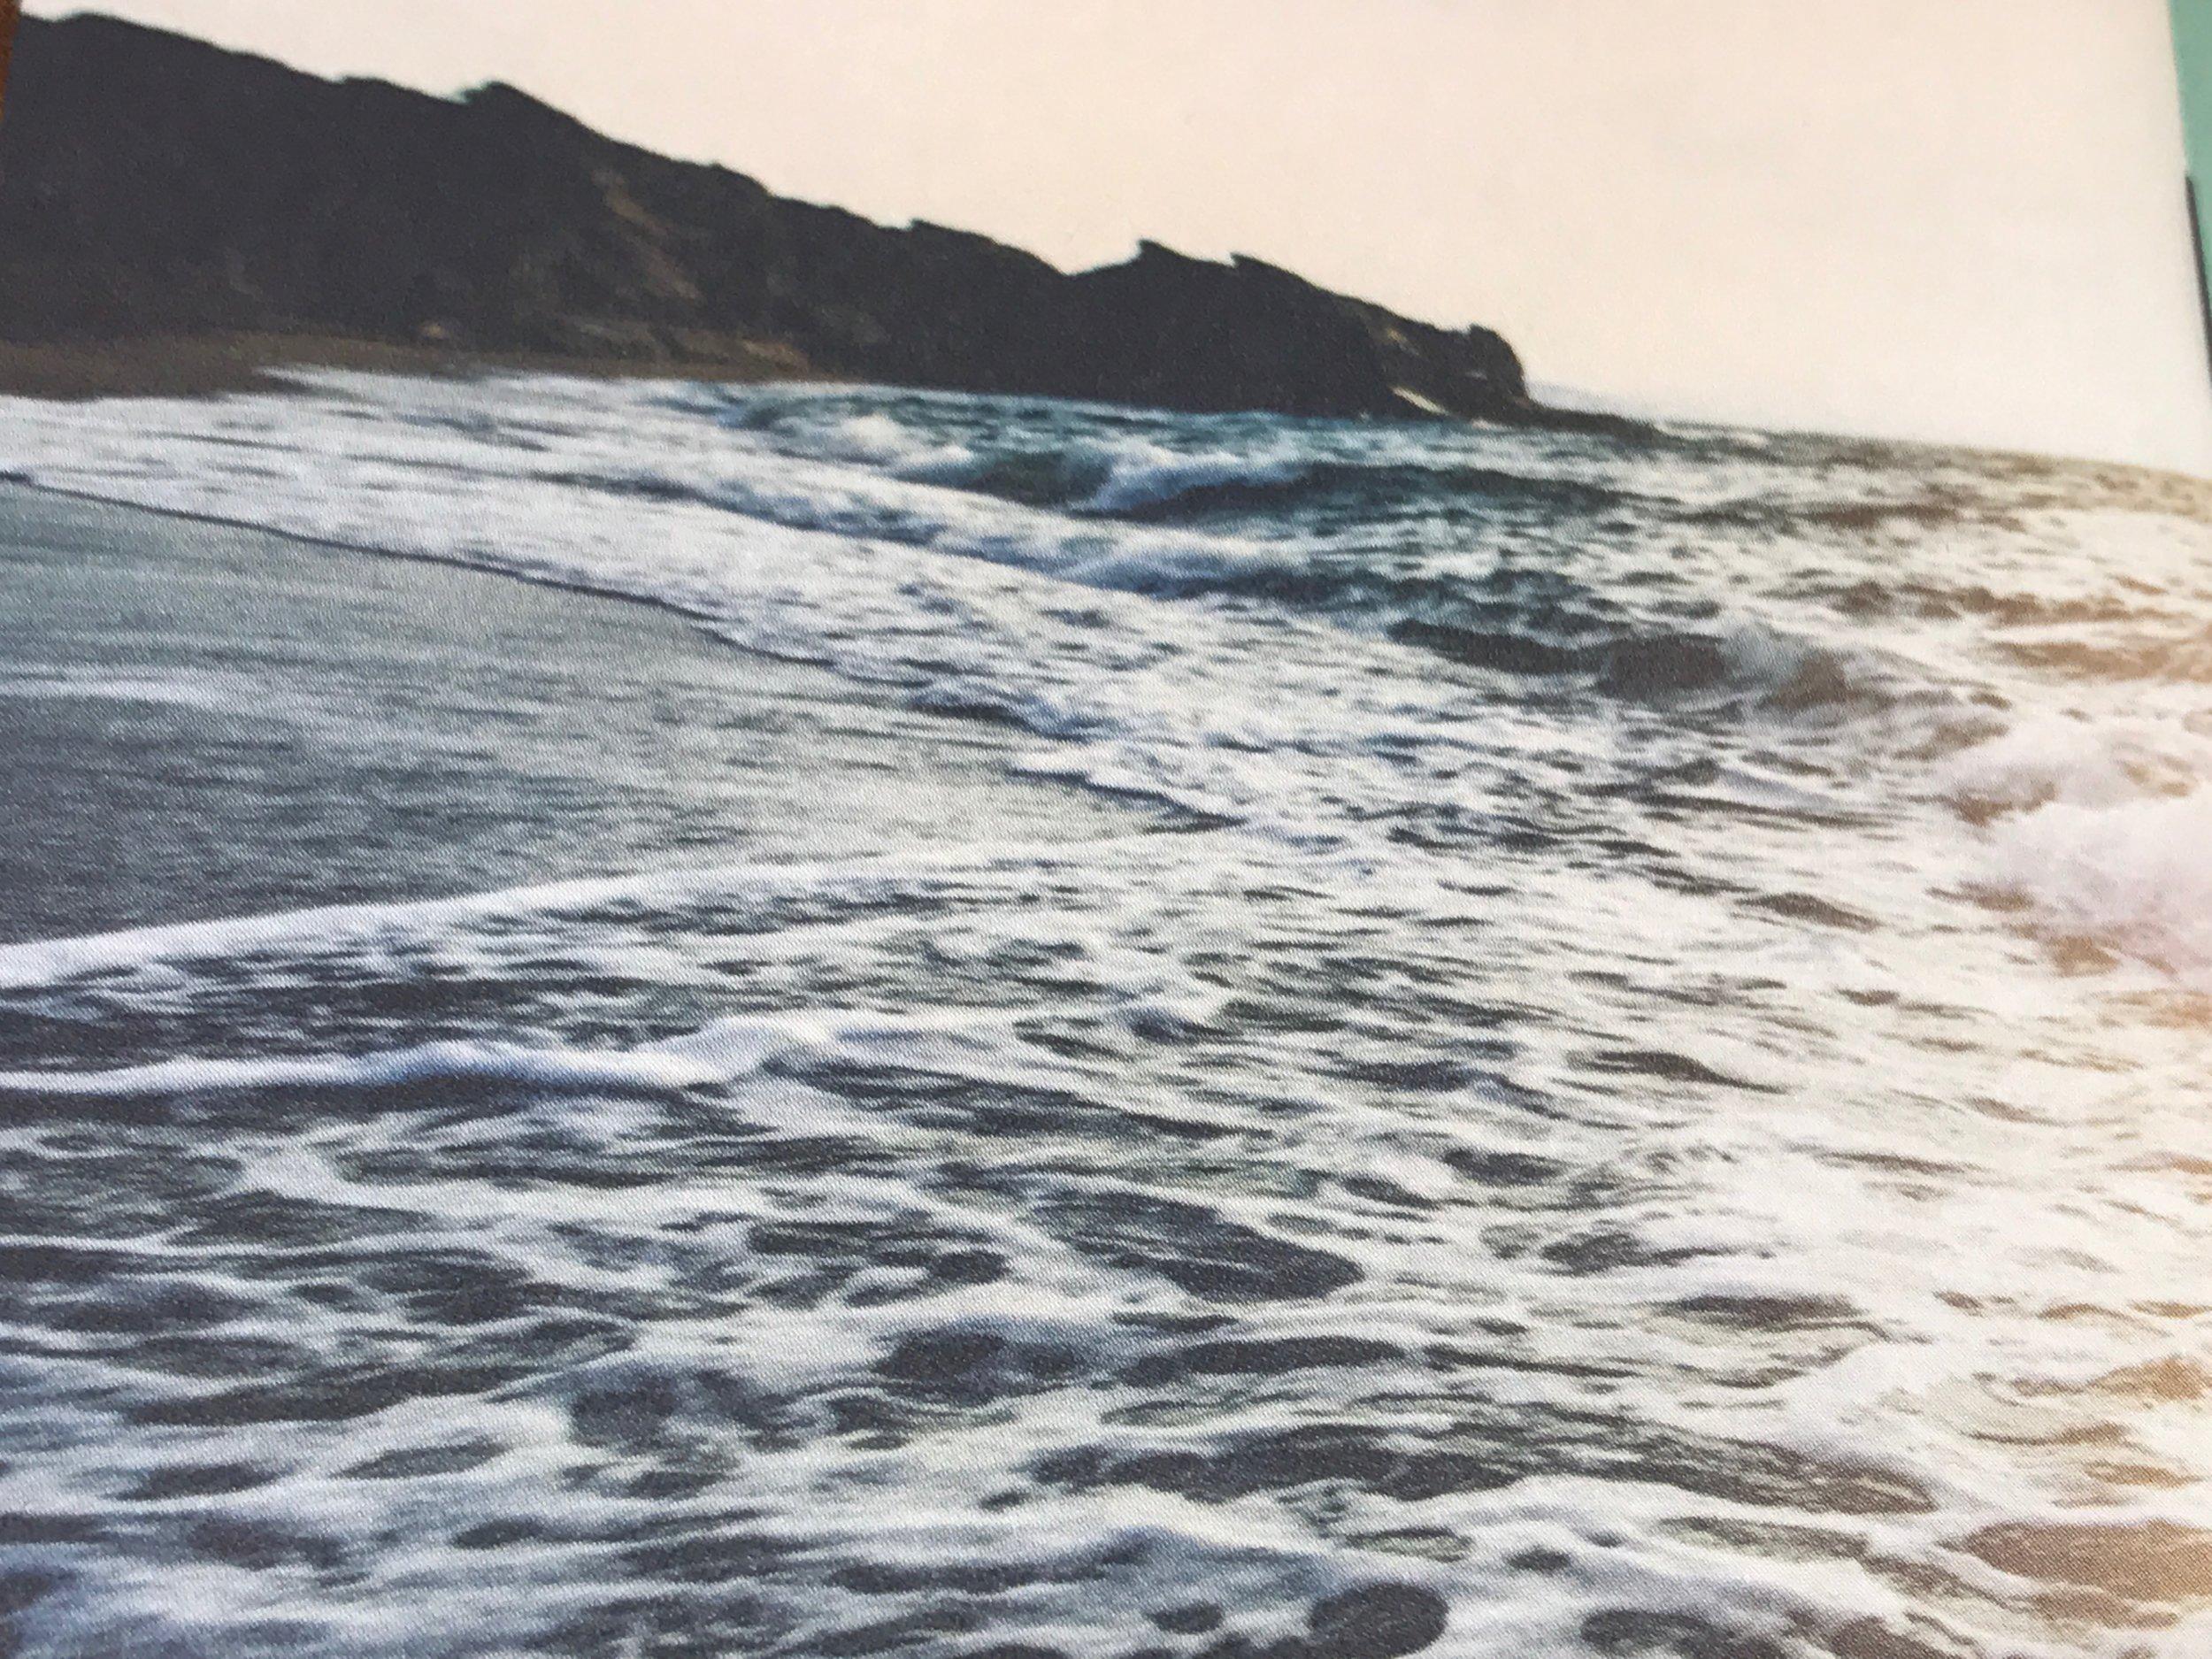 word-notebooks-beach-vibes-9.jpg